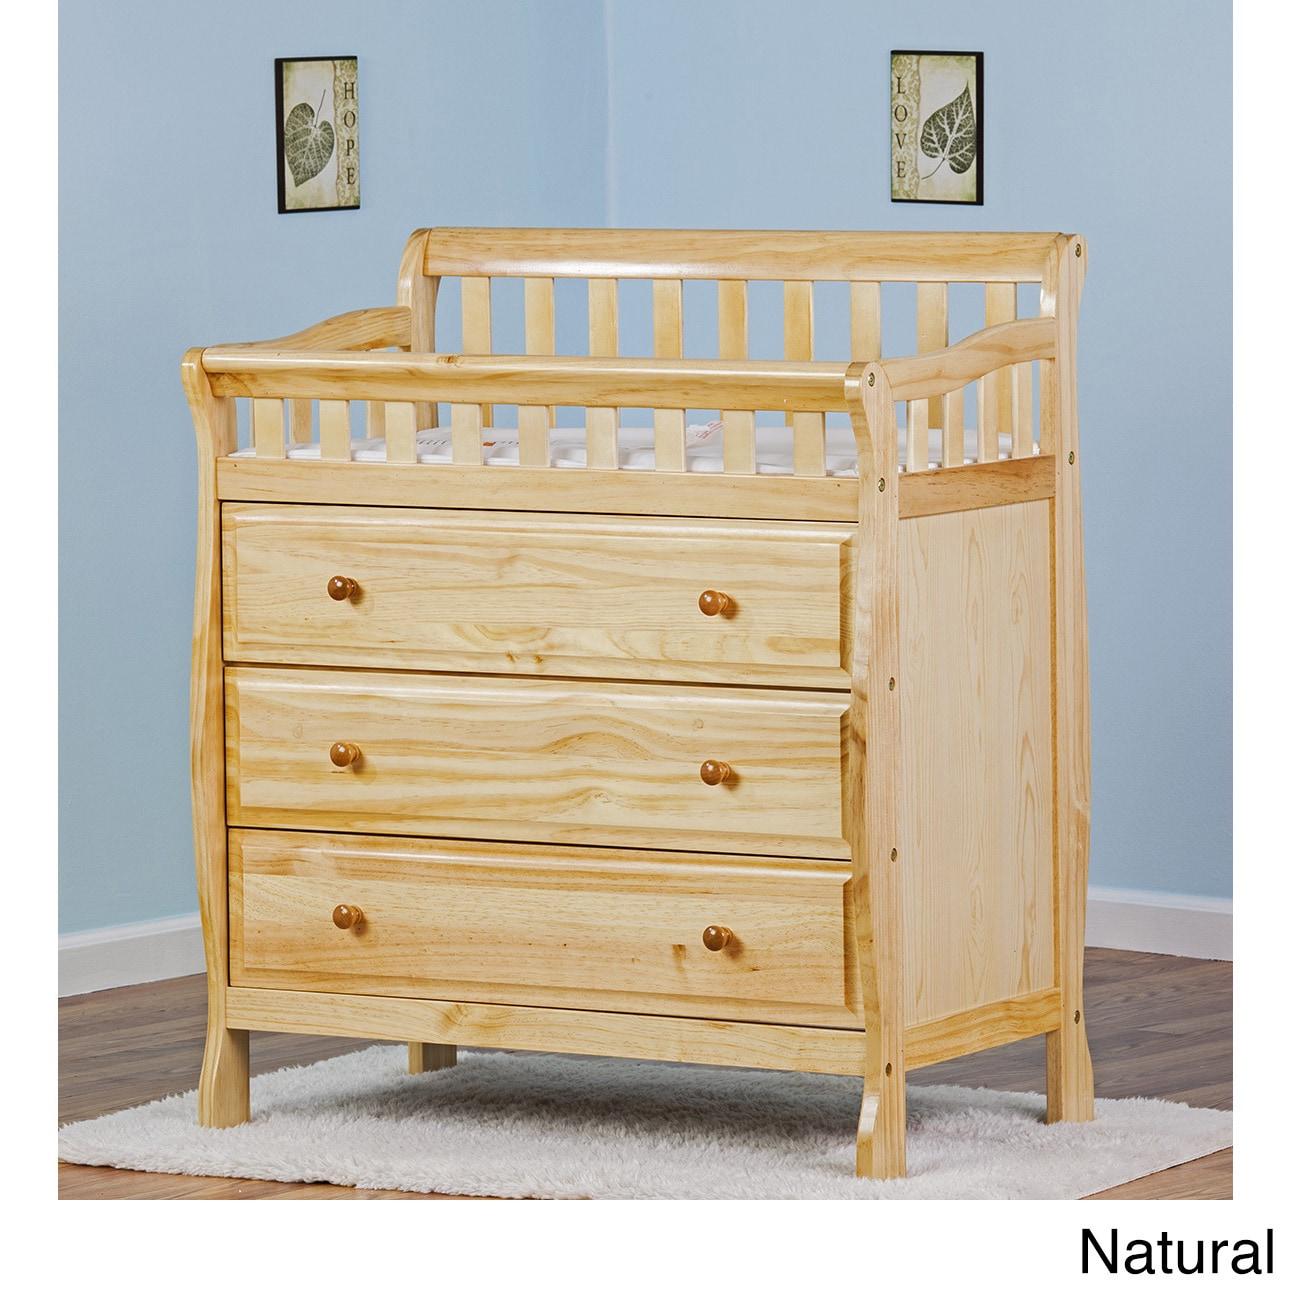 organizers best dresser baby nursery amazon sellers storage on b me ca dream furniture zydrxkl hampers